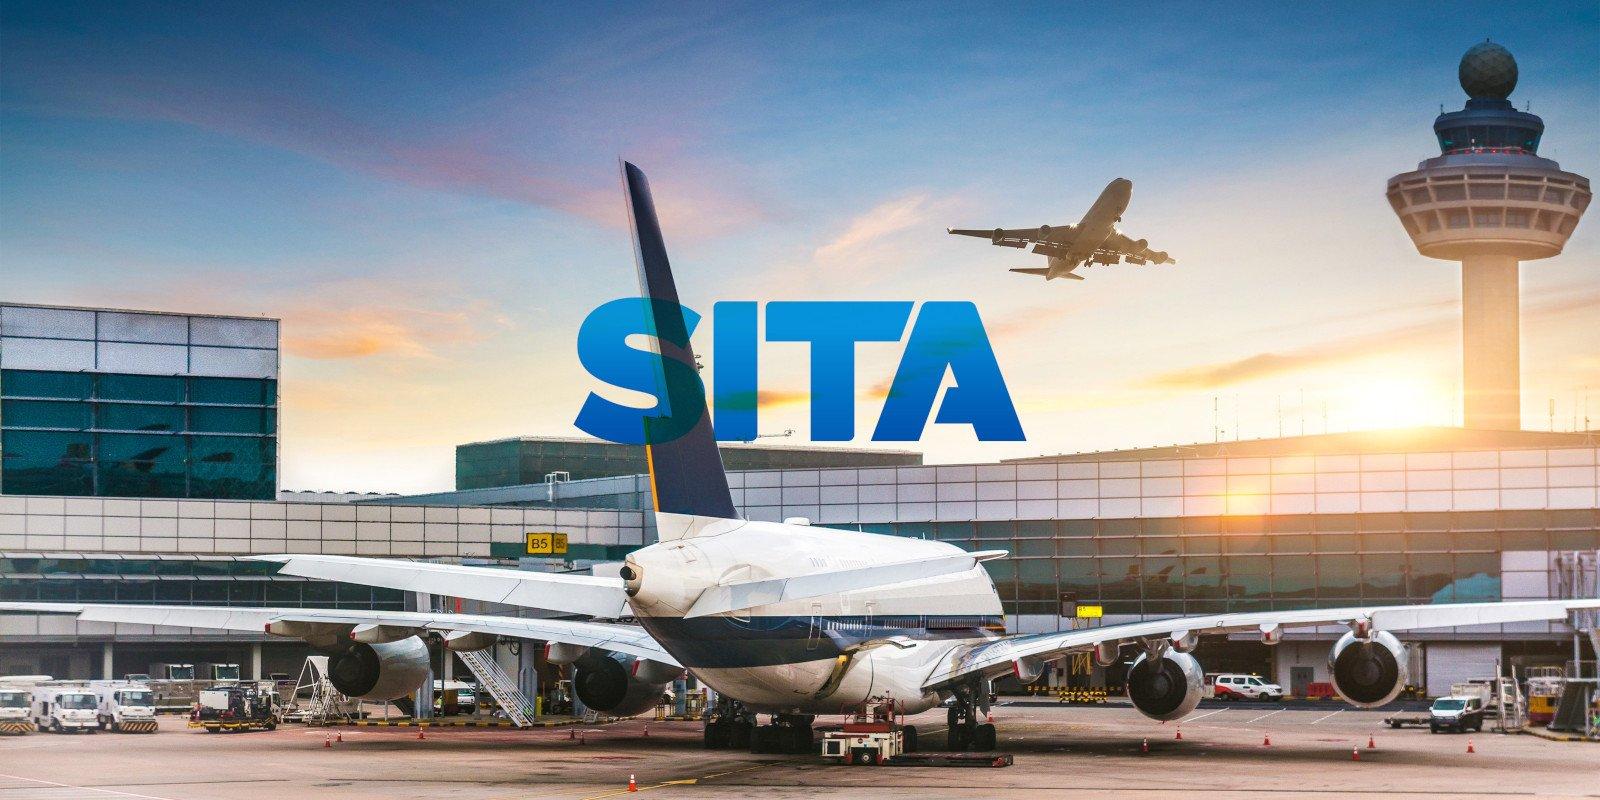 Целый ряд авиакомпаний стали жертвами атаки на цепочку поставок